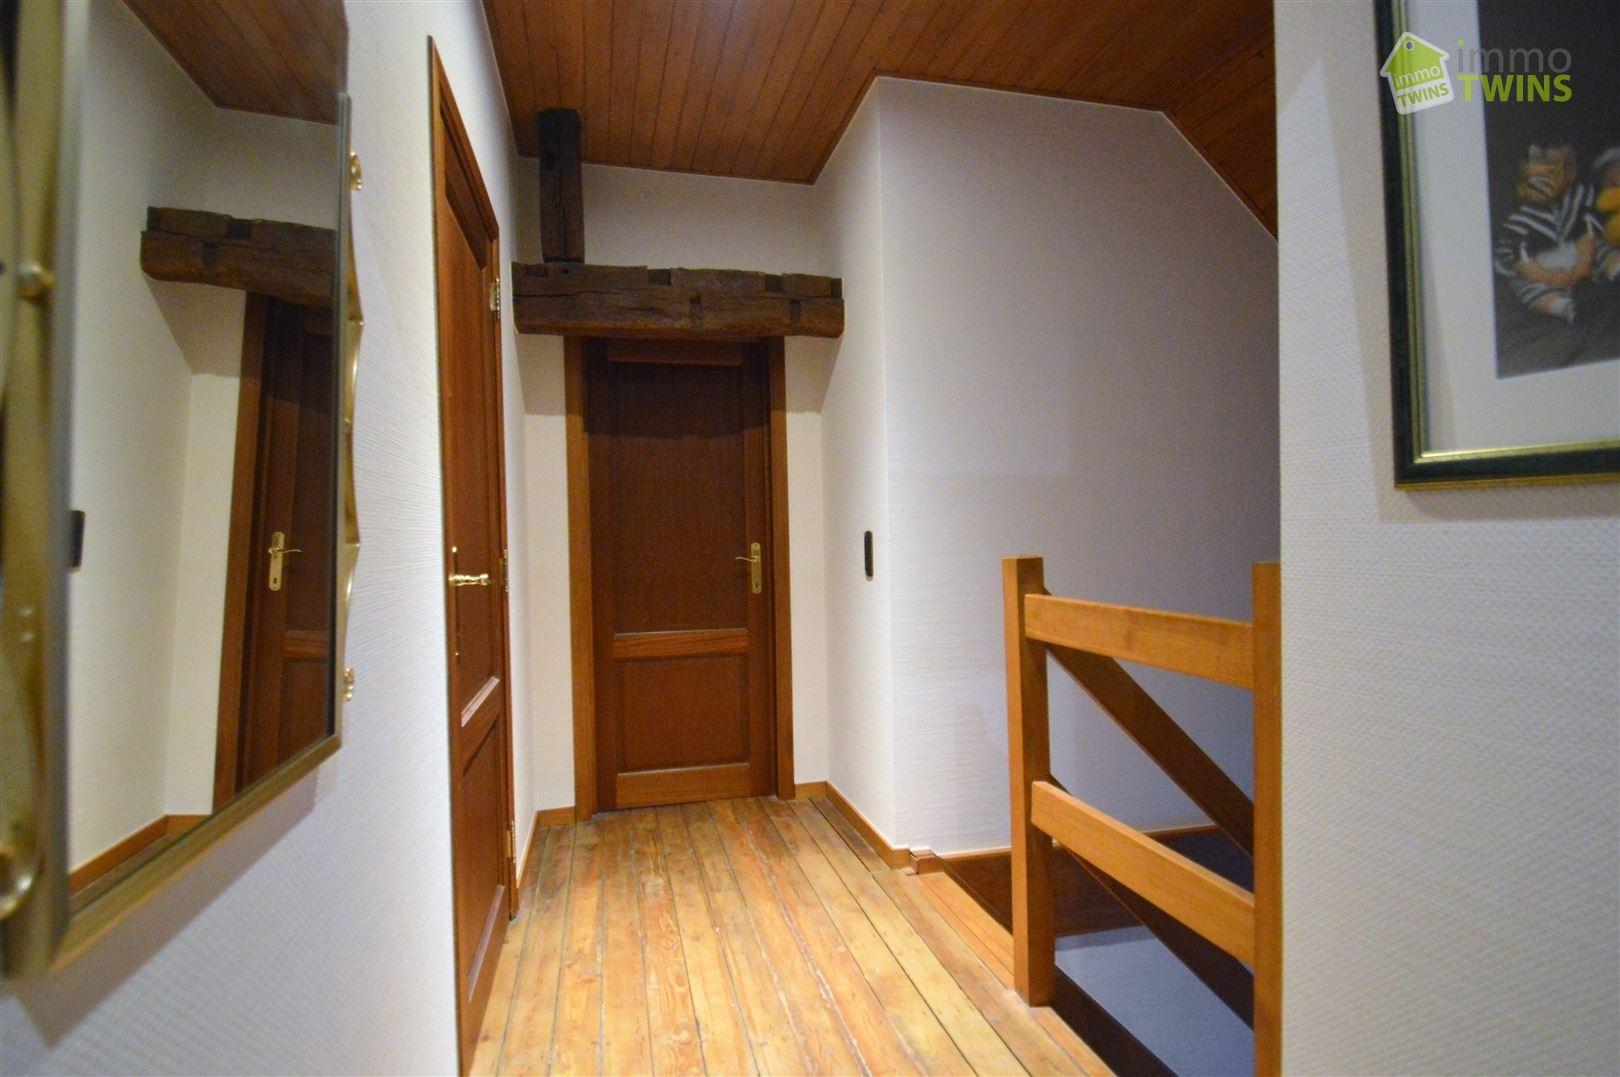 Foto 22 : Duplex/Penthouse te 2890 SINT-AMANDS (België) - Prijs € 429.000